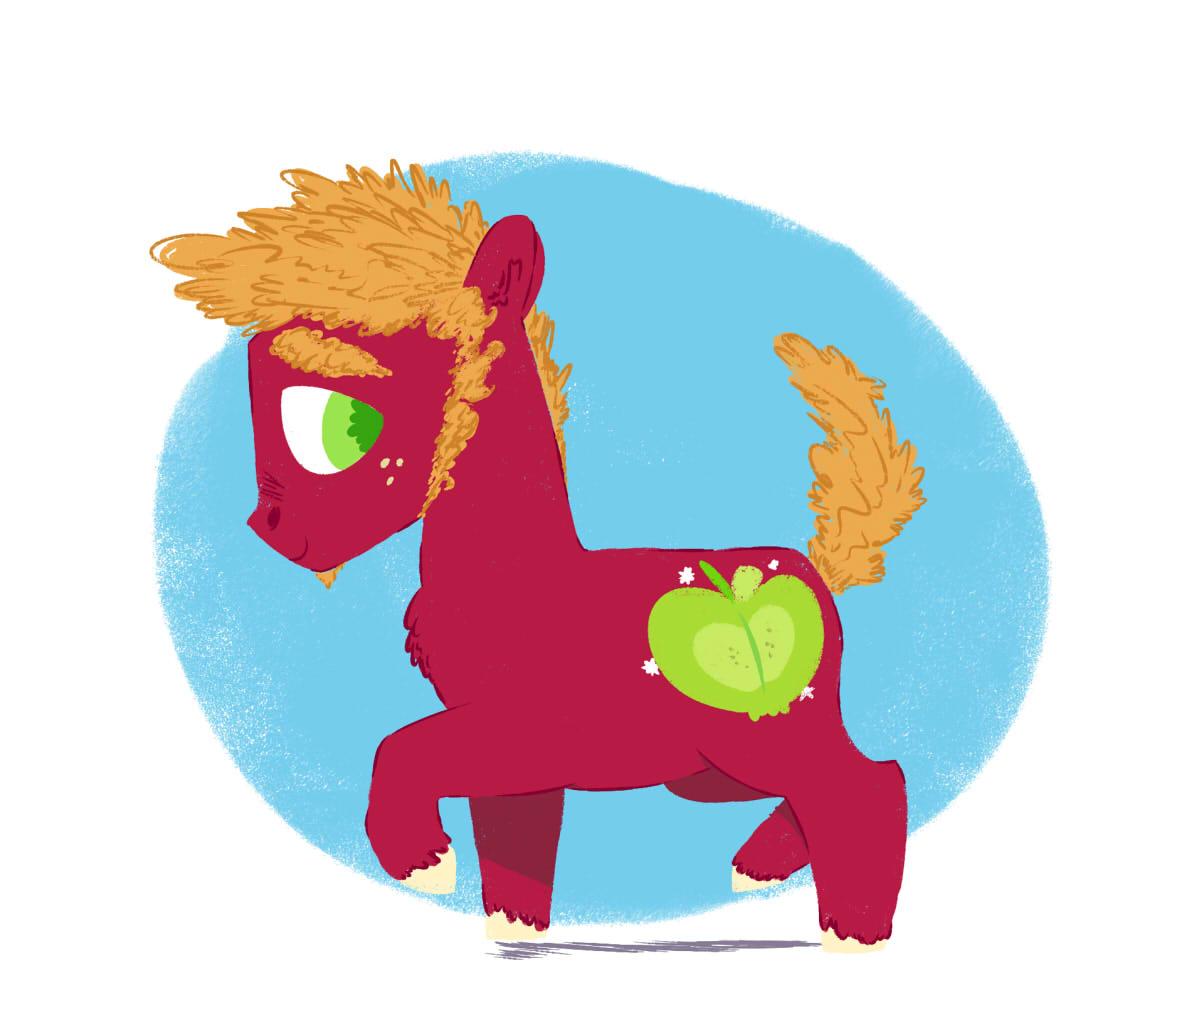 Shaggy Mac by Blleeeaauuurrgghhh